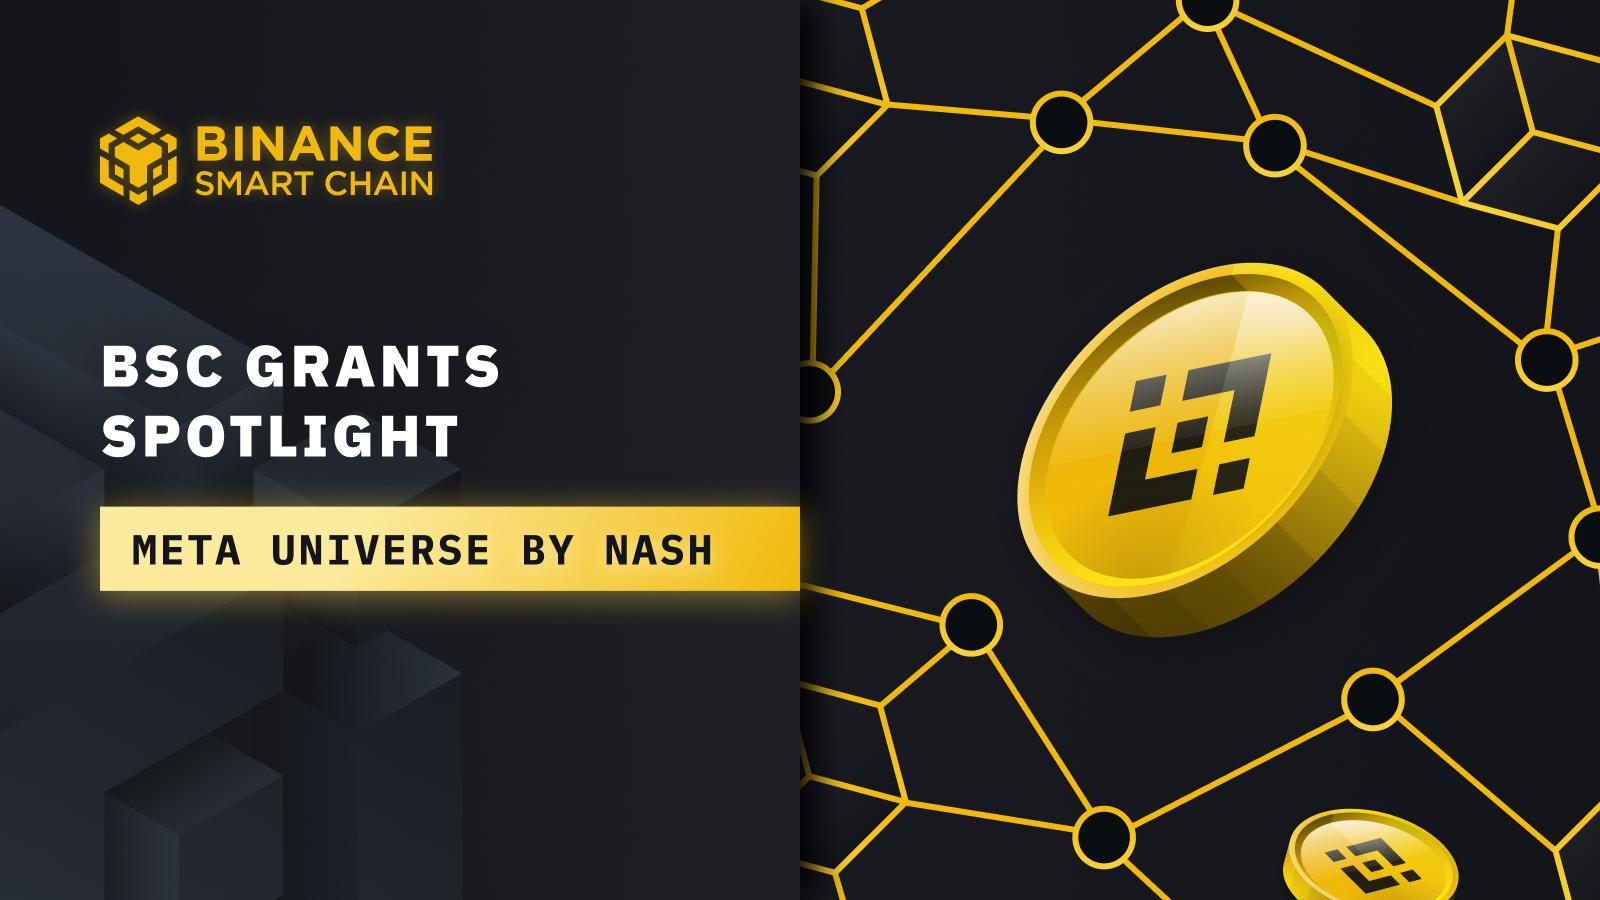 BSC Grants Spotlight: Meta Universe by Nash